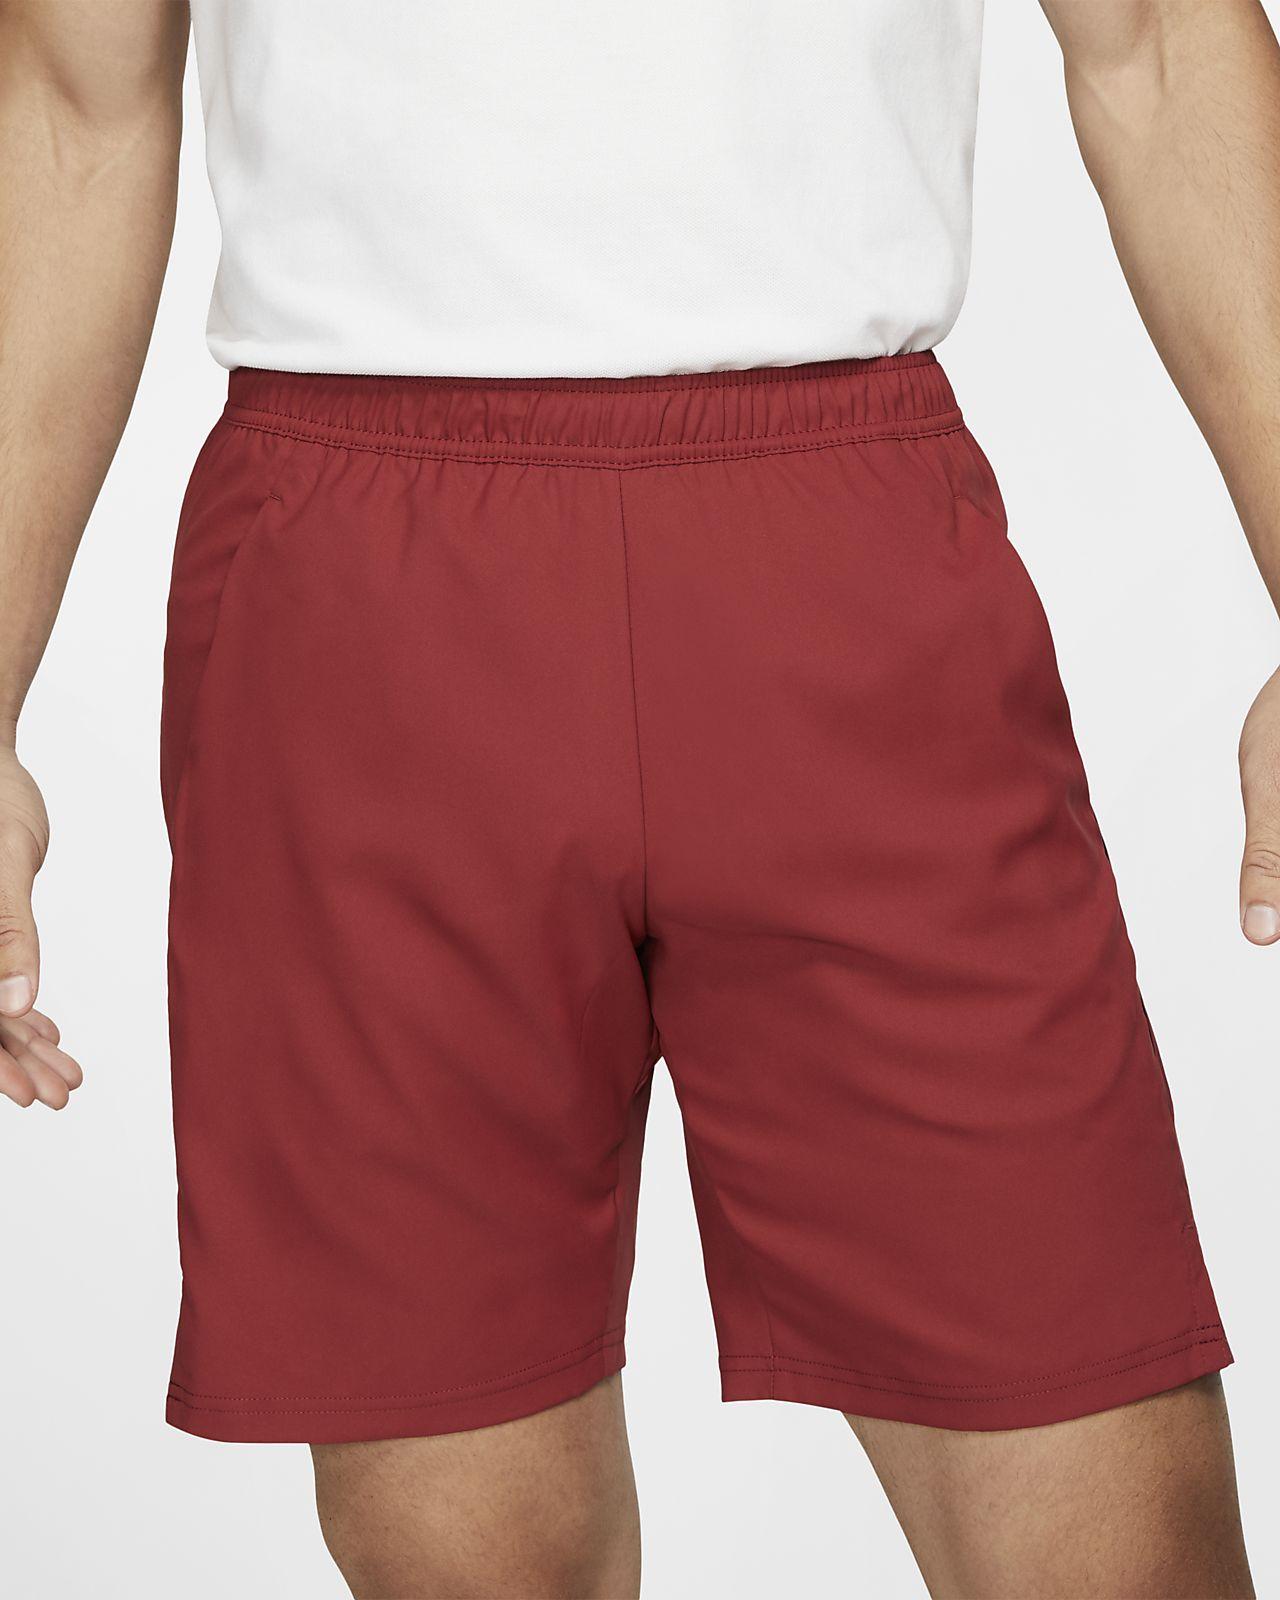 nike 9 tennis shorts